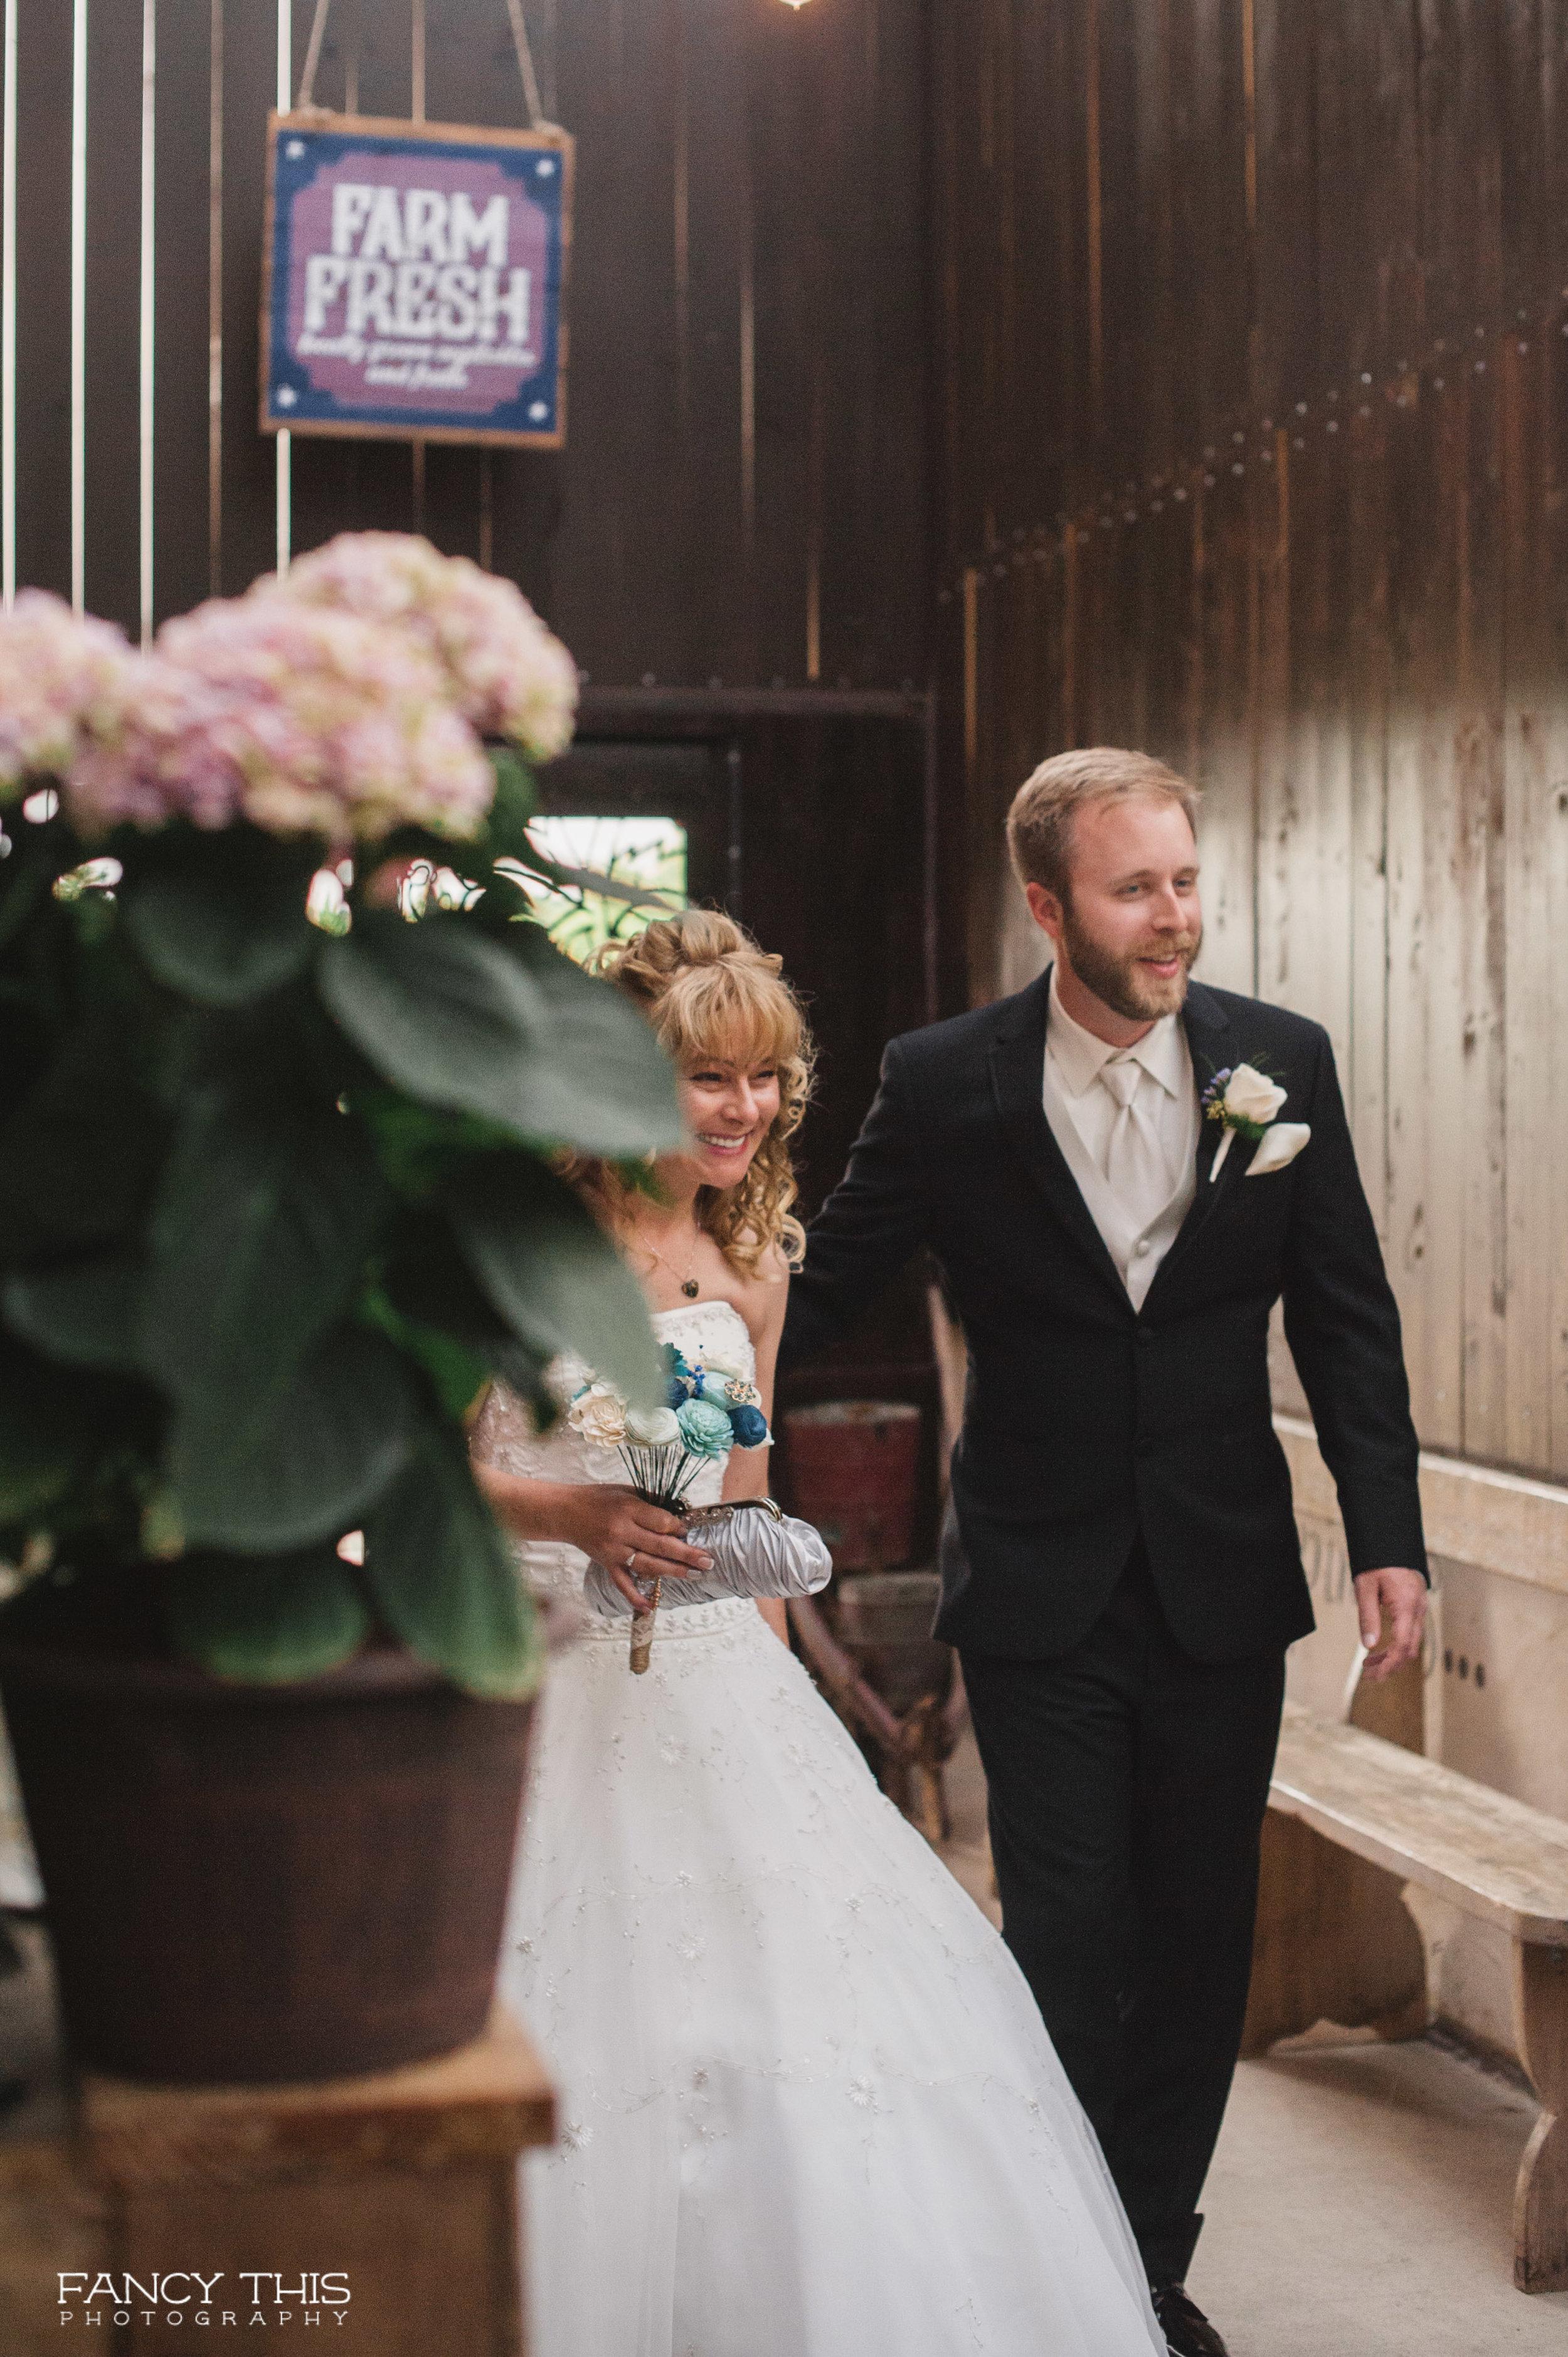 courtneyjasonwedding_socialmediaready167.jpg